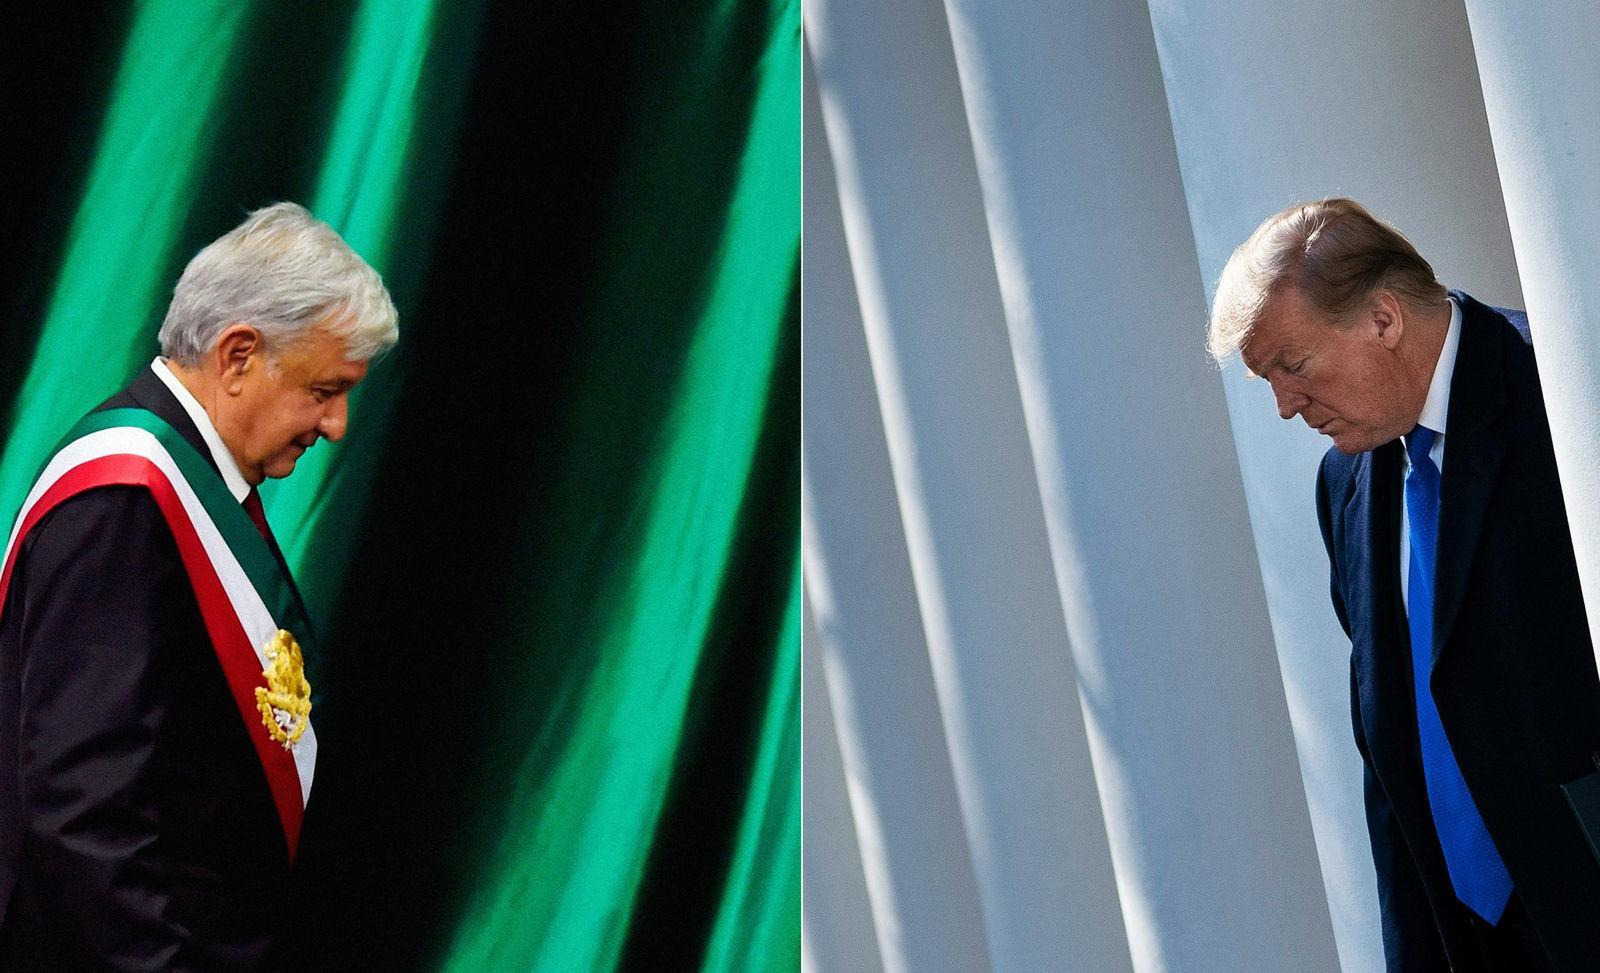 Donald Trump recibirá  'pronto' a López Obrador